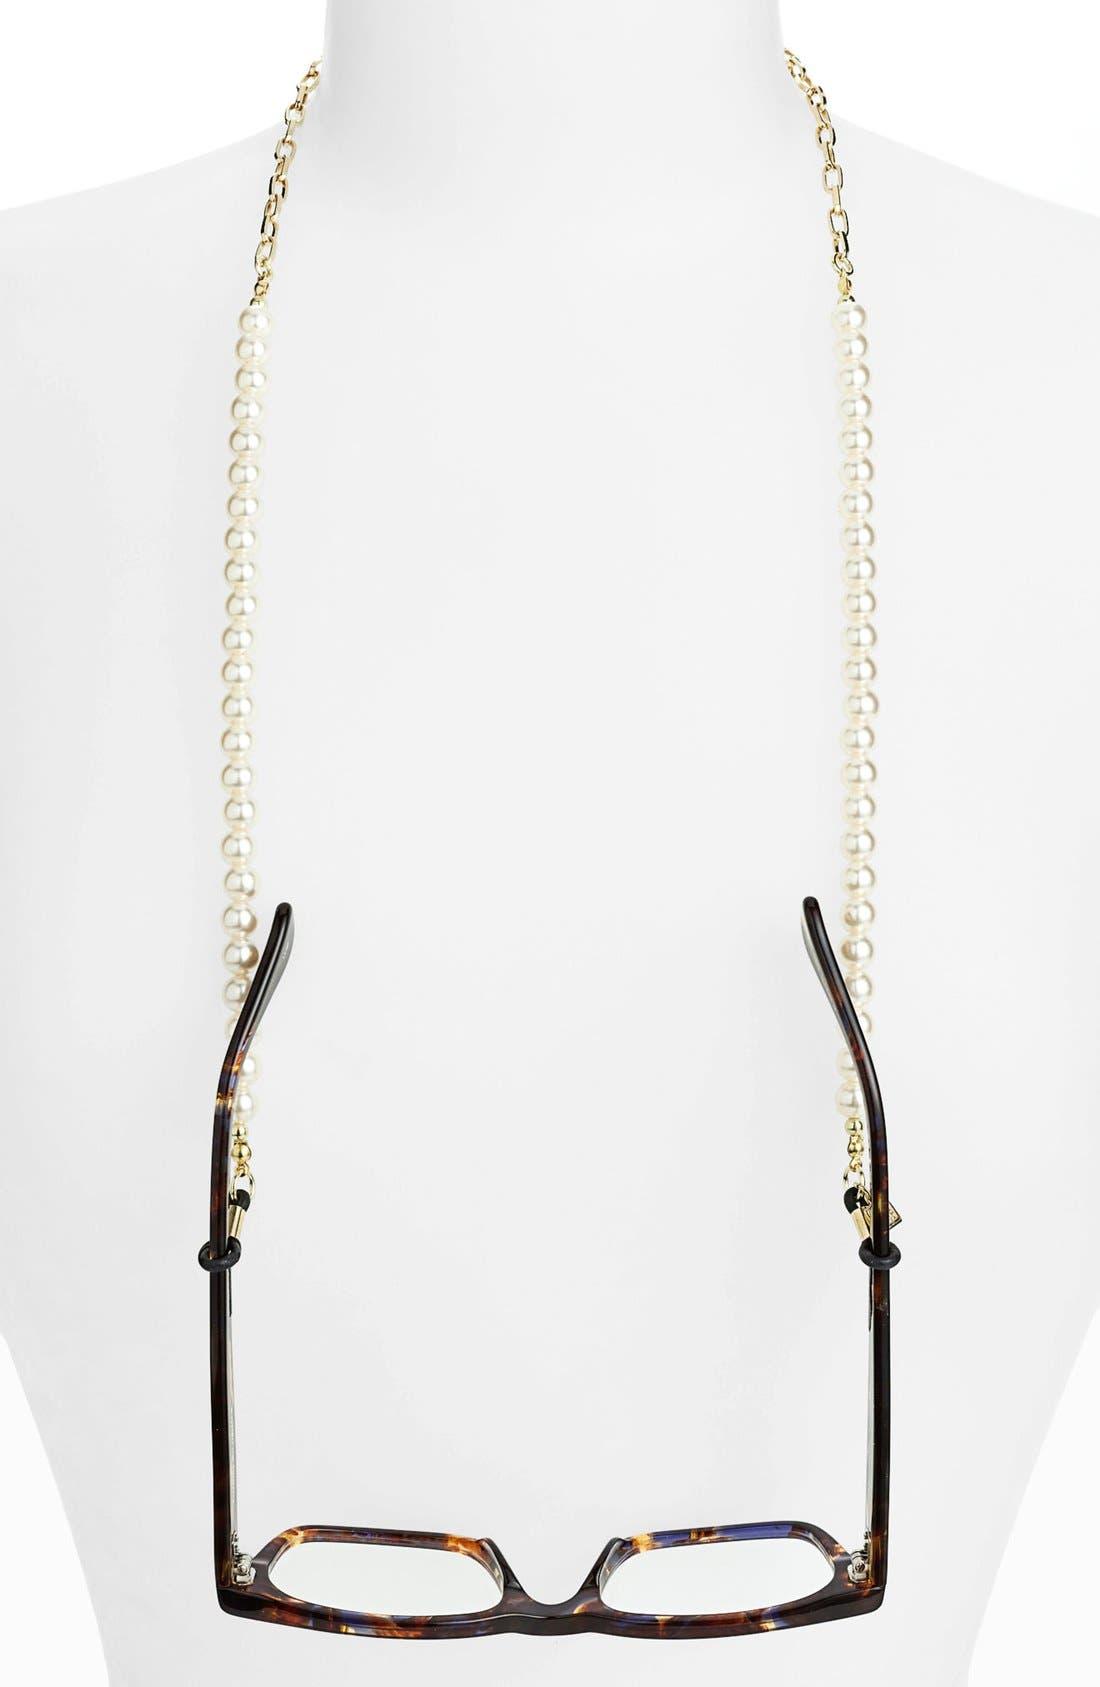 'Pearls' Eyewear Chain,                             Main thumbnail 1, color,                             900